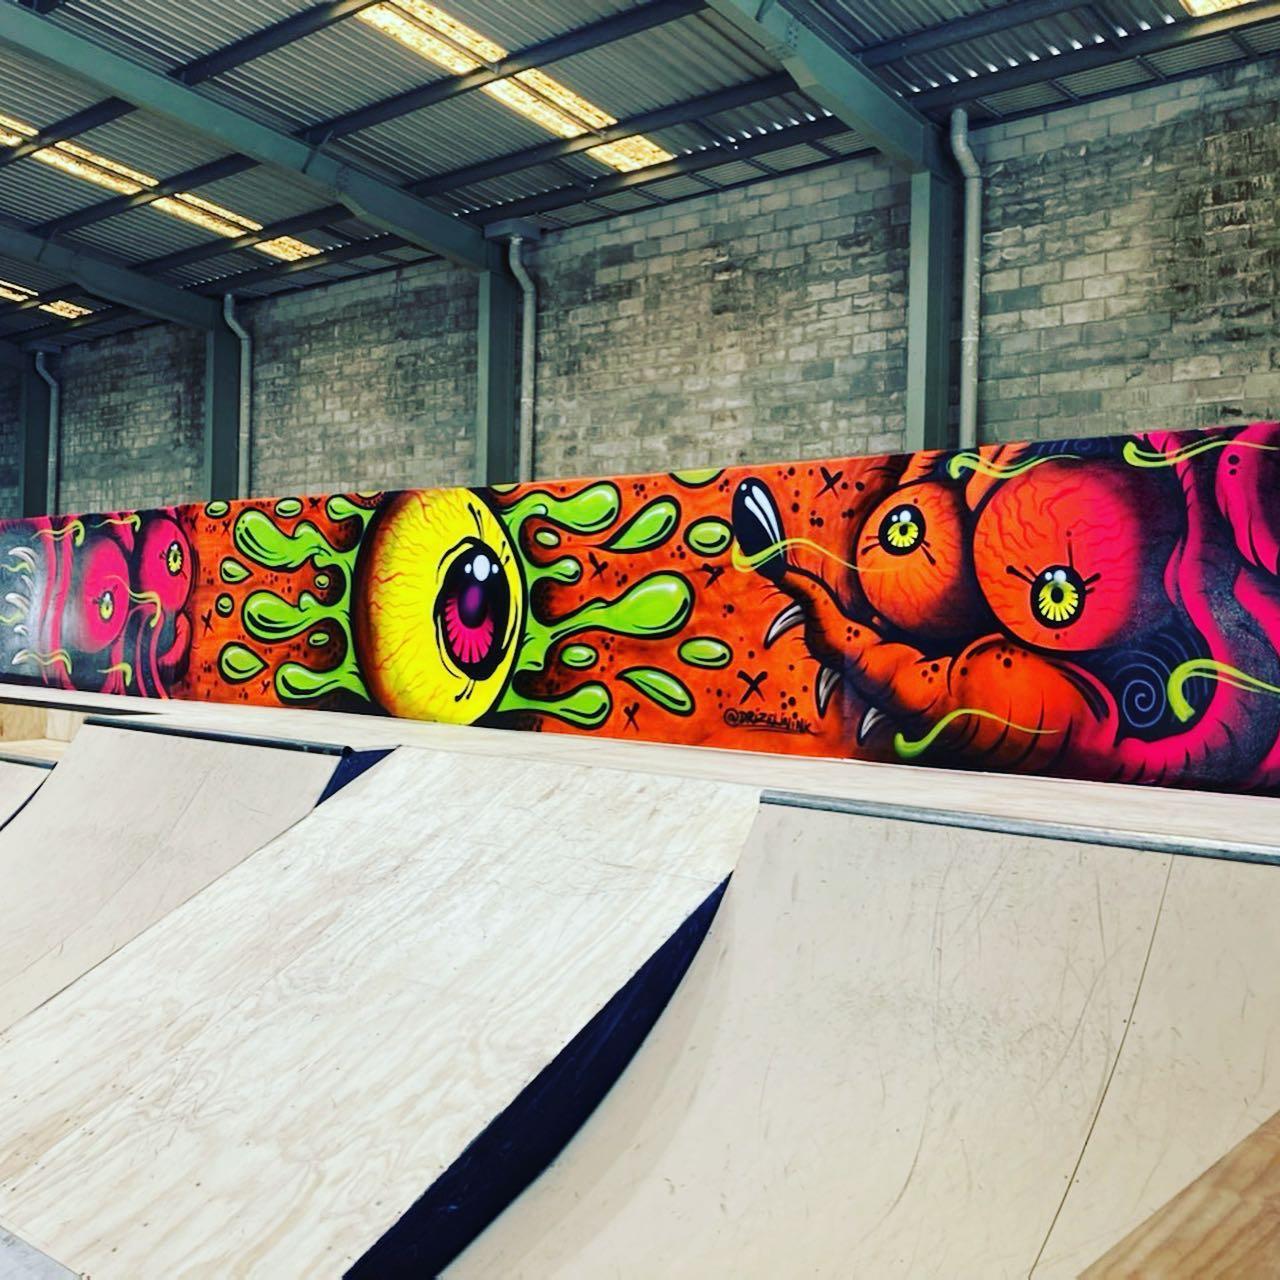 Quarters, banks and graffiti at Level Up Skatepark